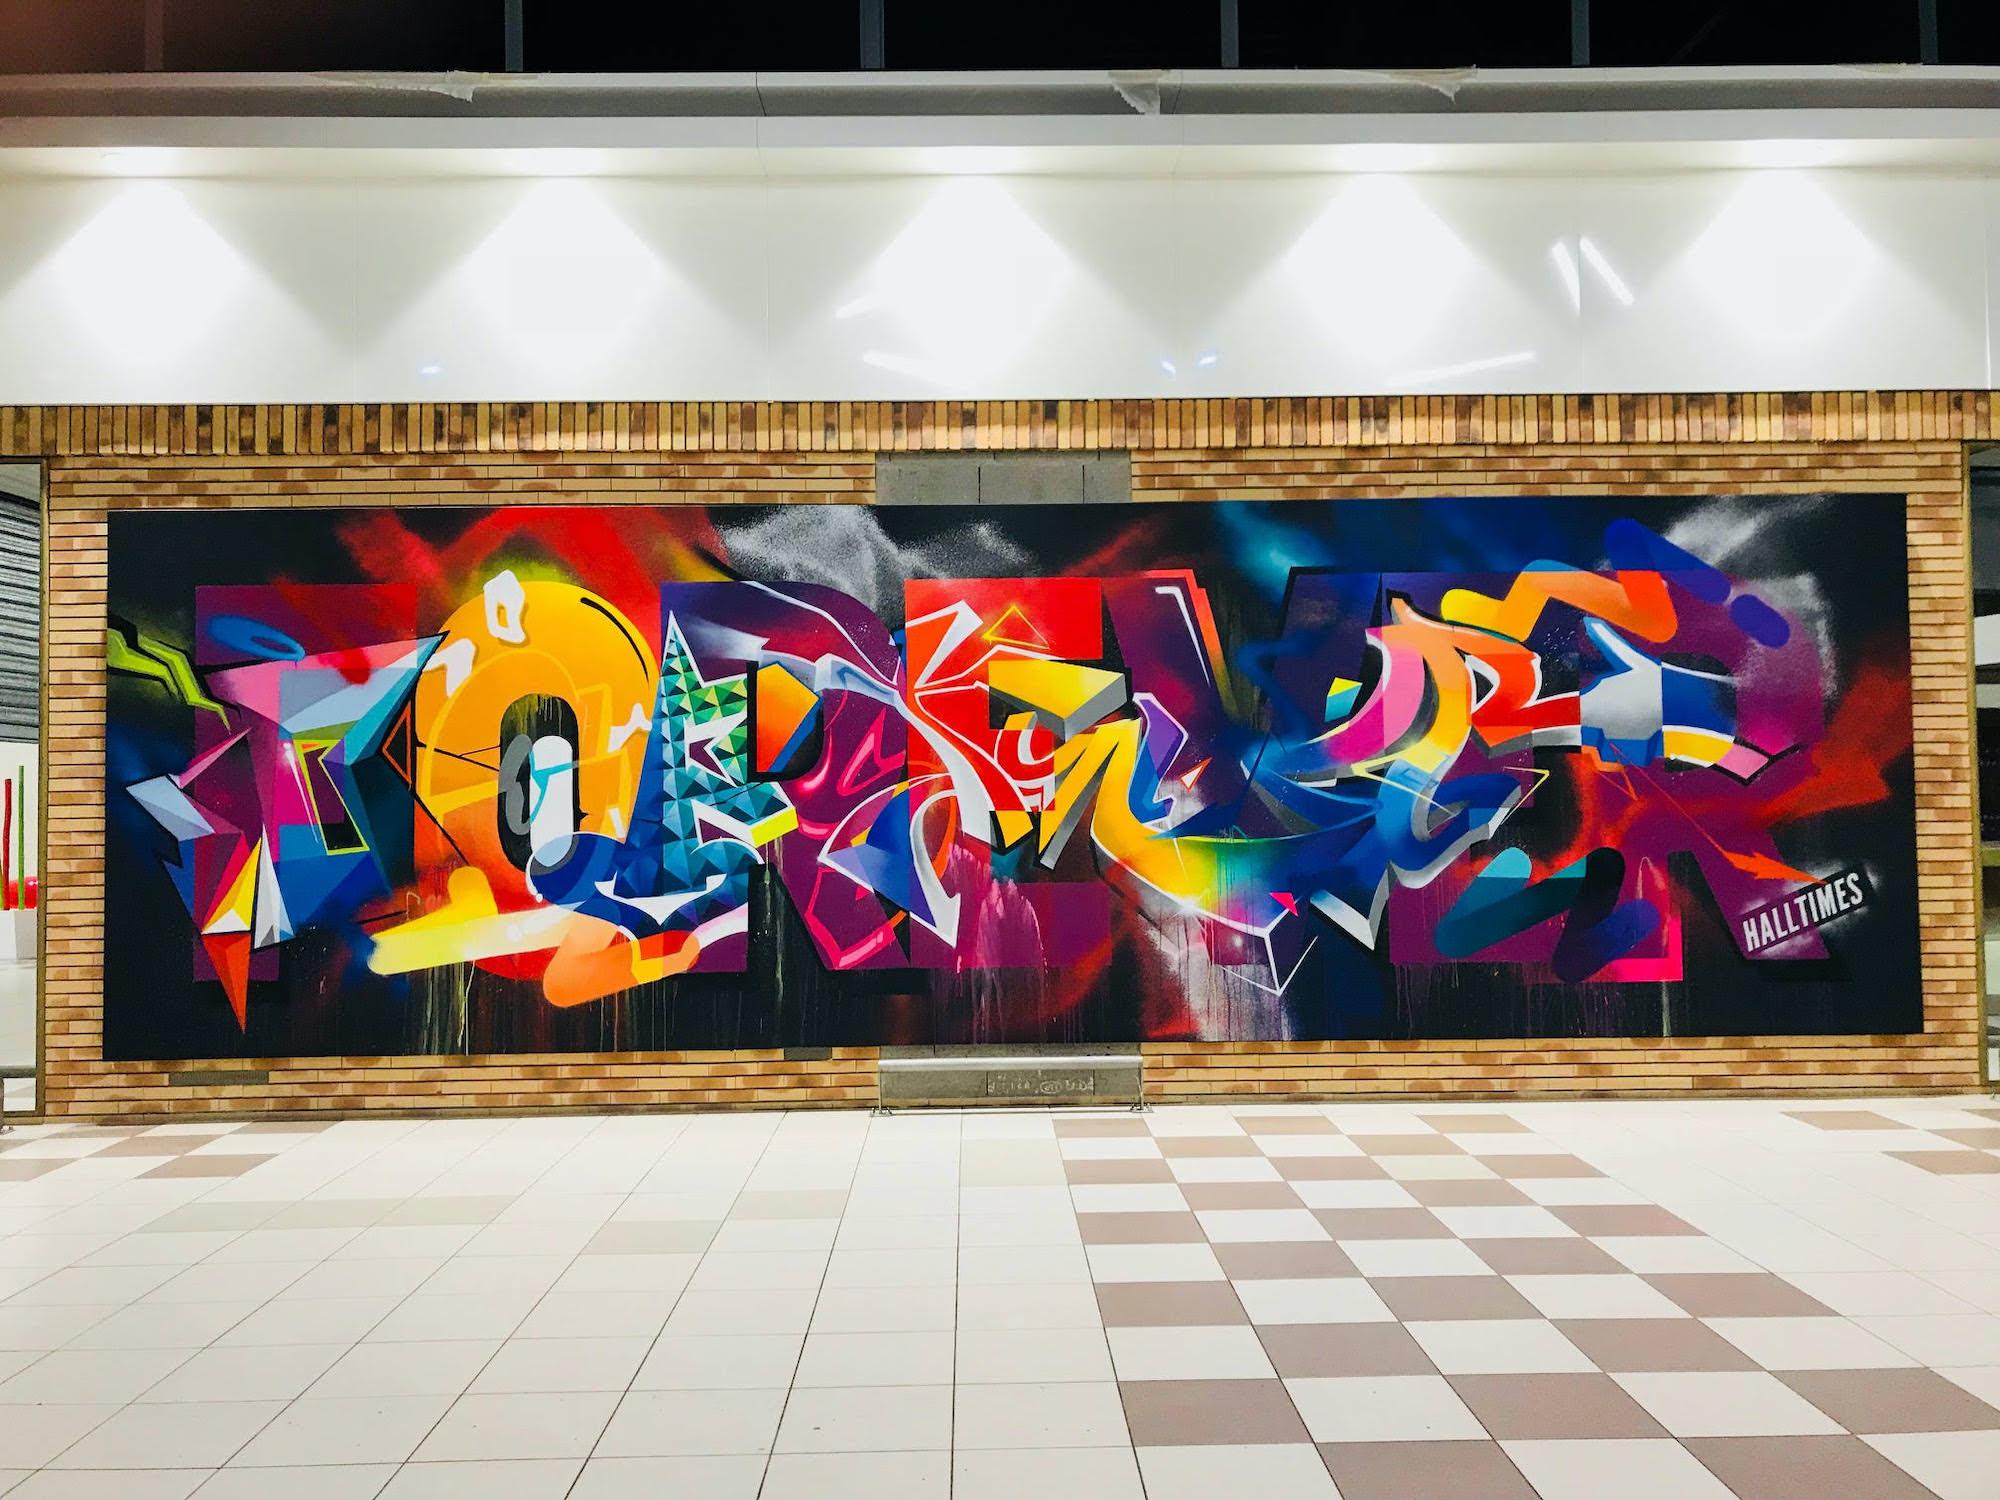 graffiti_fresque_auch_toulouse_graffeur_streetart